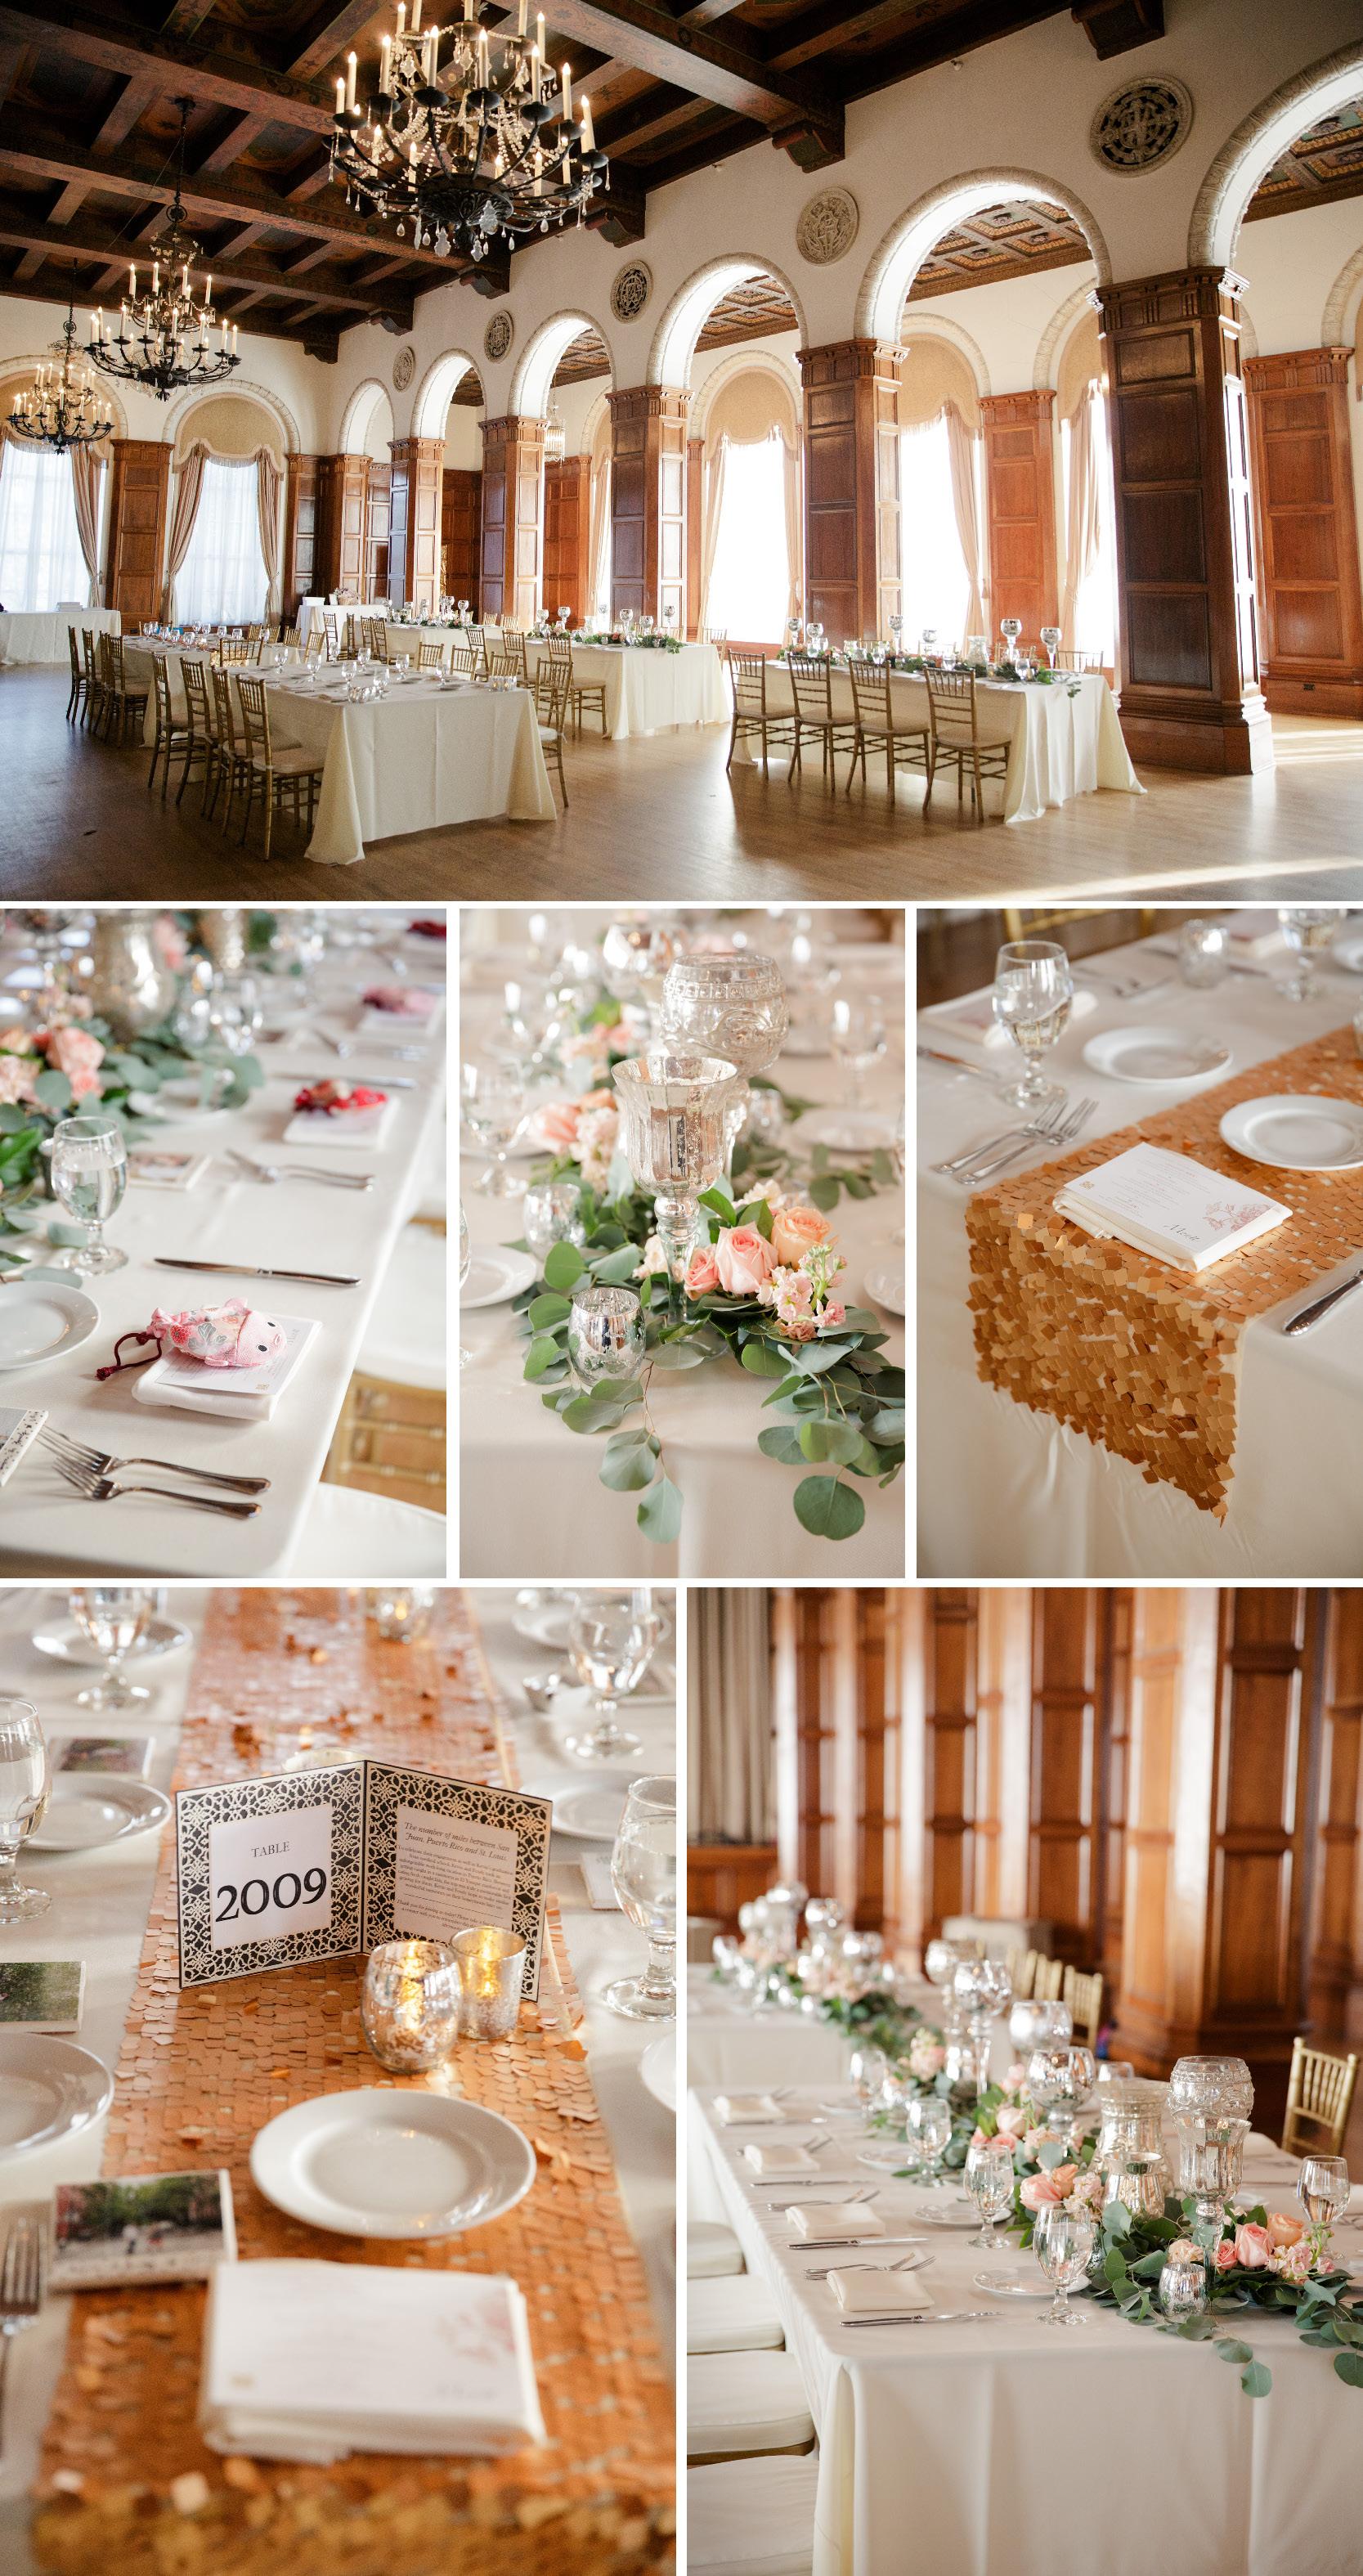 park plaza wedding venue reception details eucalyptus leaves candle center pieces gold table runners art deco wedding